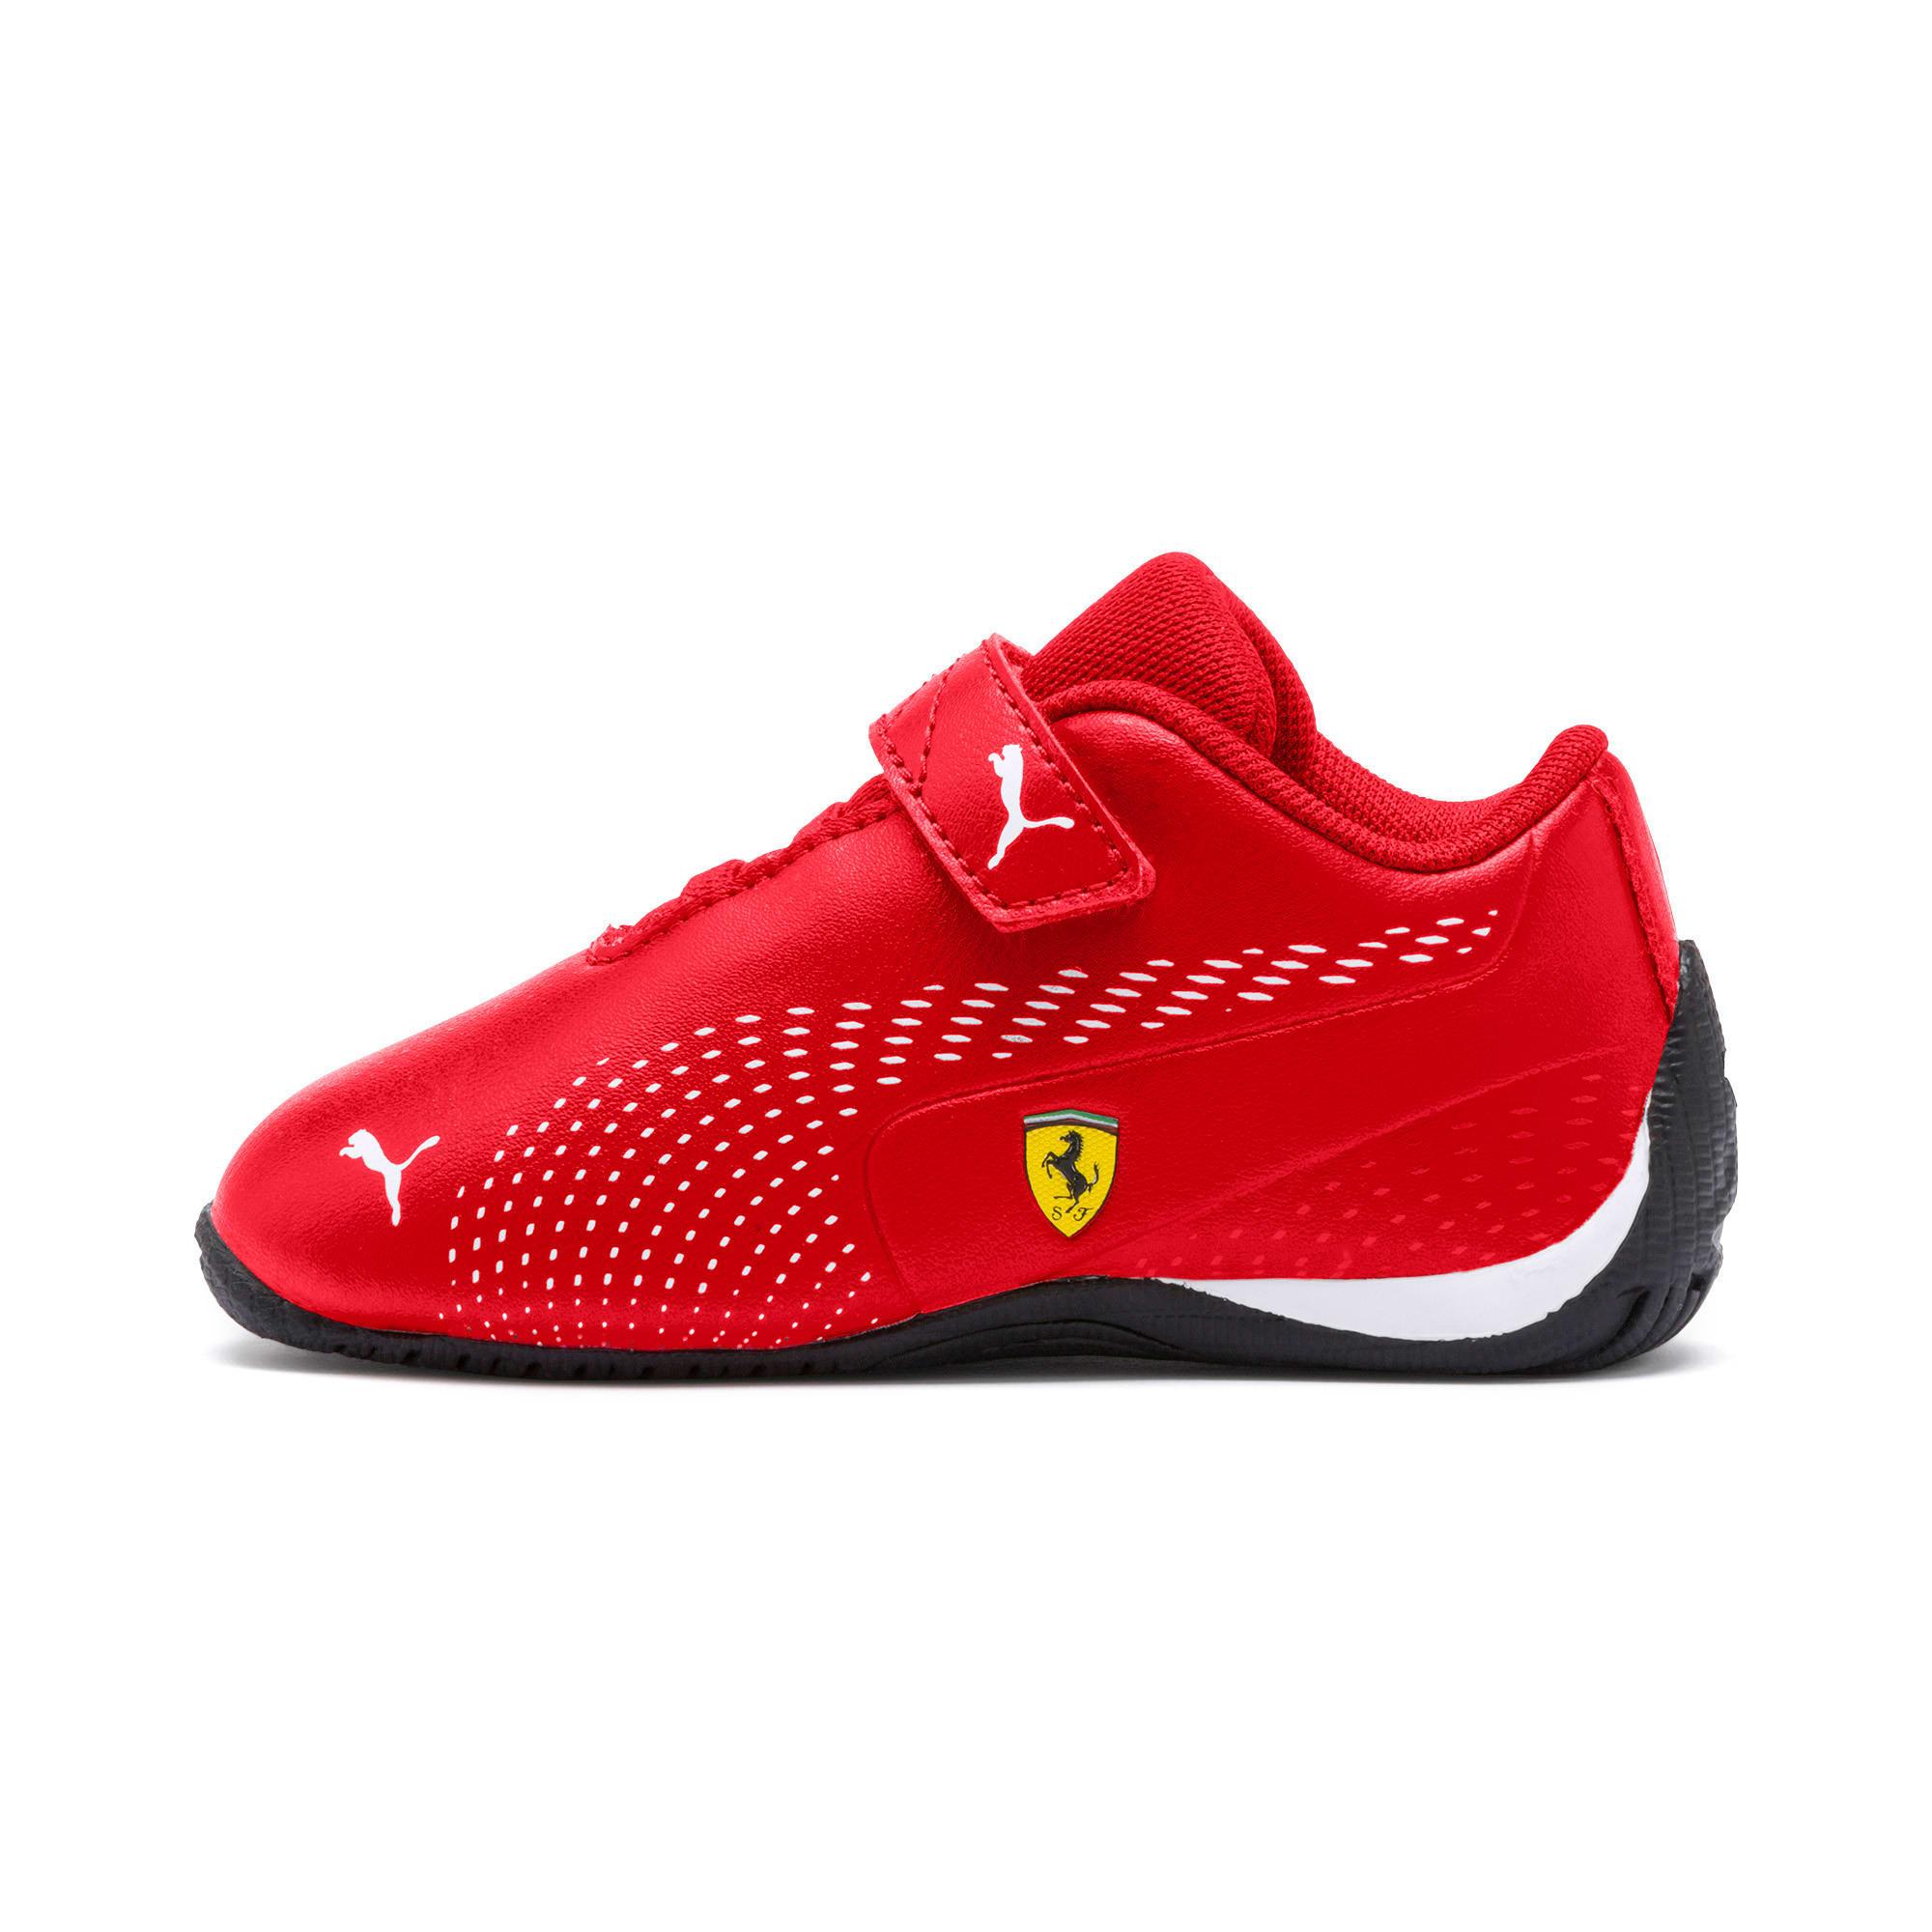 Thumbnail 1 of Scuderia Ferrari Drift Cat 5 Ultra II Toddler Shoes, Rosso Corsa-Puma White, medium